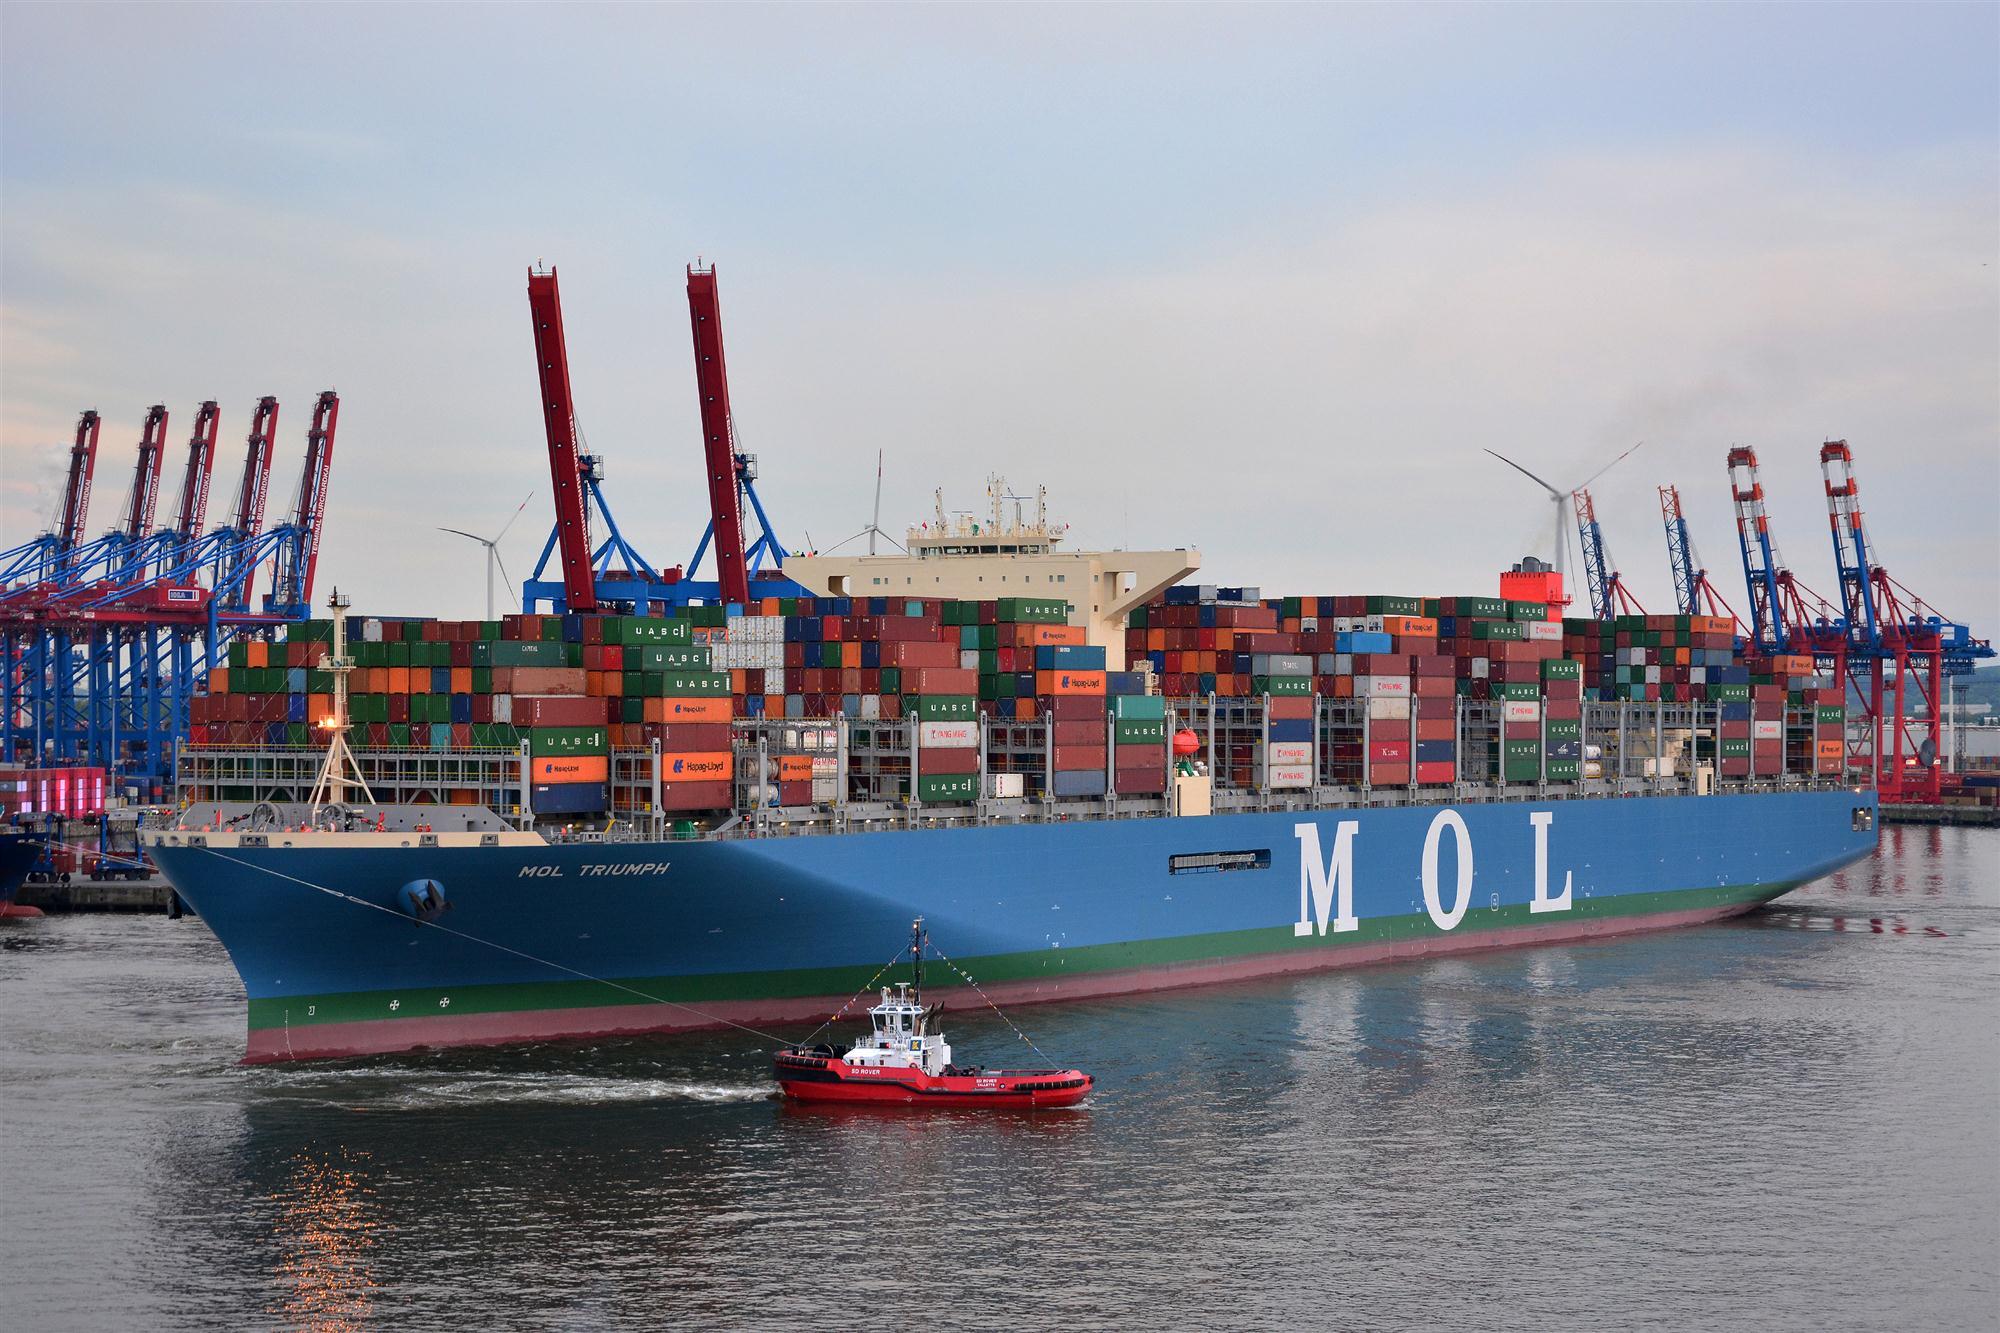 Self Photos / Files - MOL Triumph Hamburg